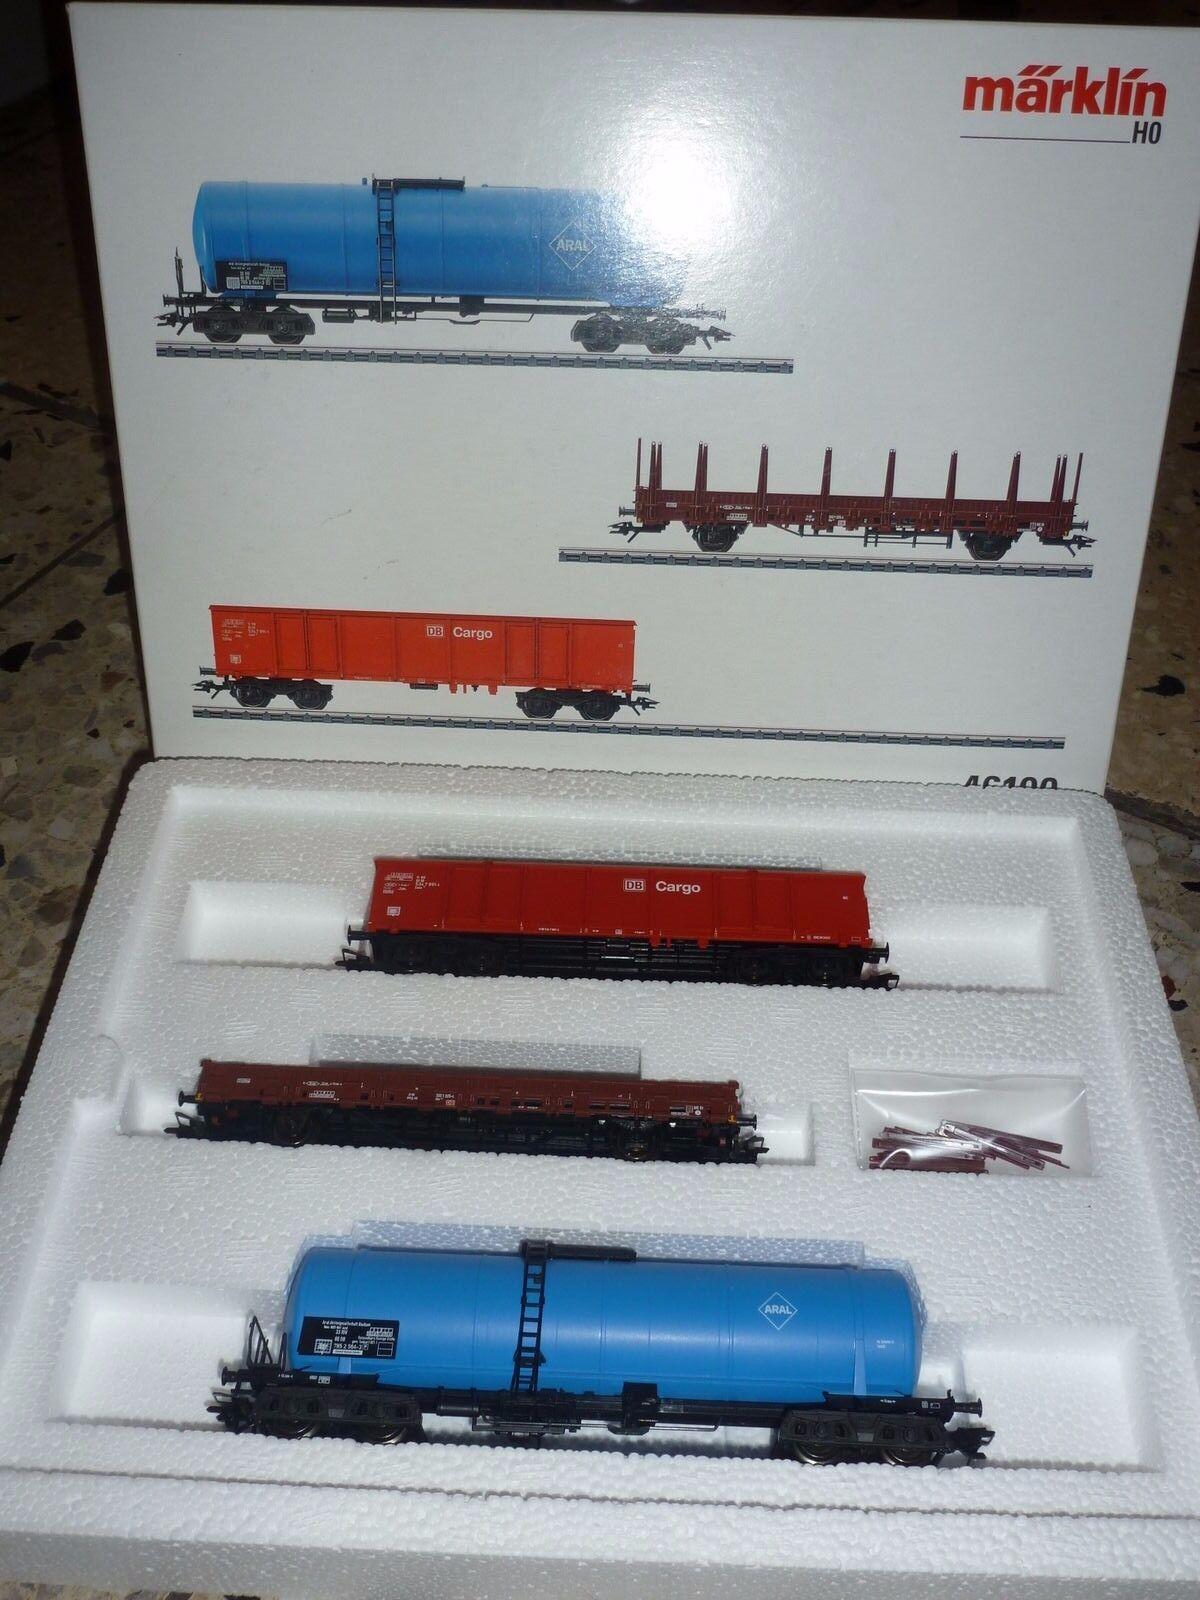 , auto-Set di moderni trasporto merci n. 46190 3 pezzi